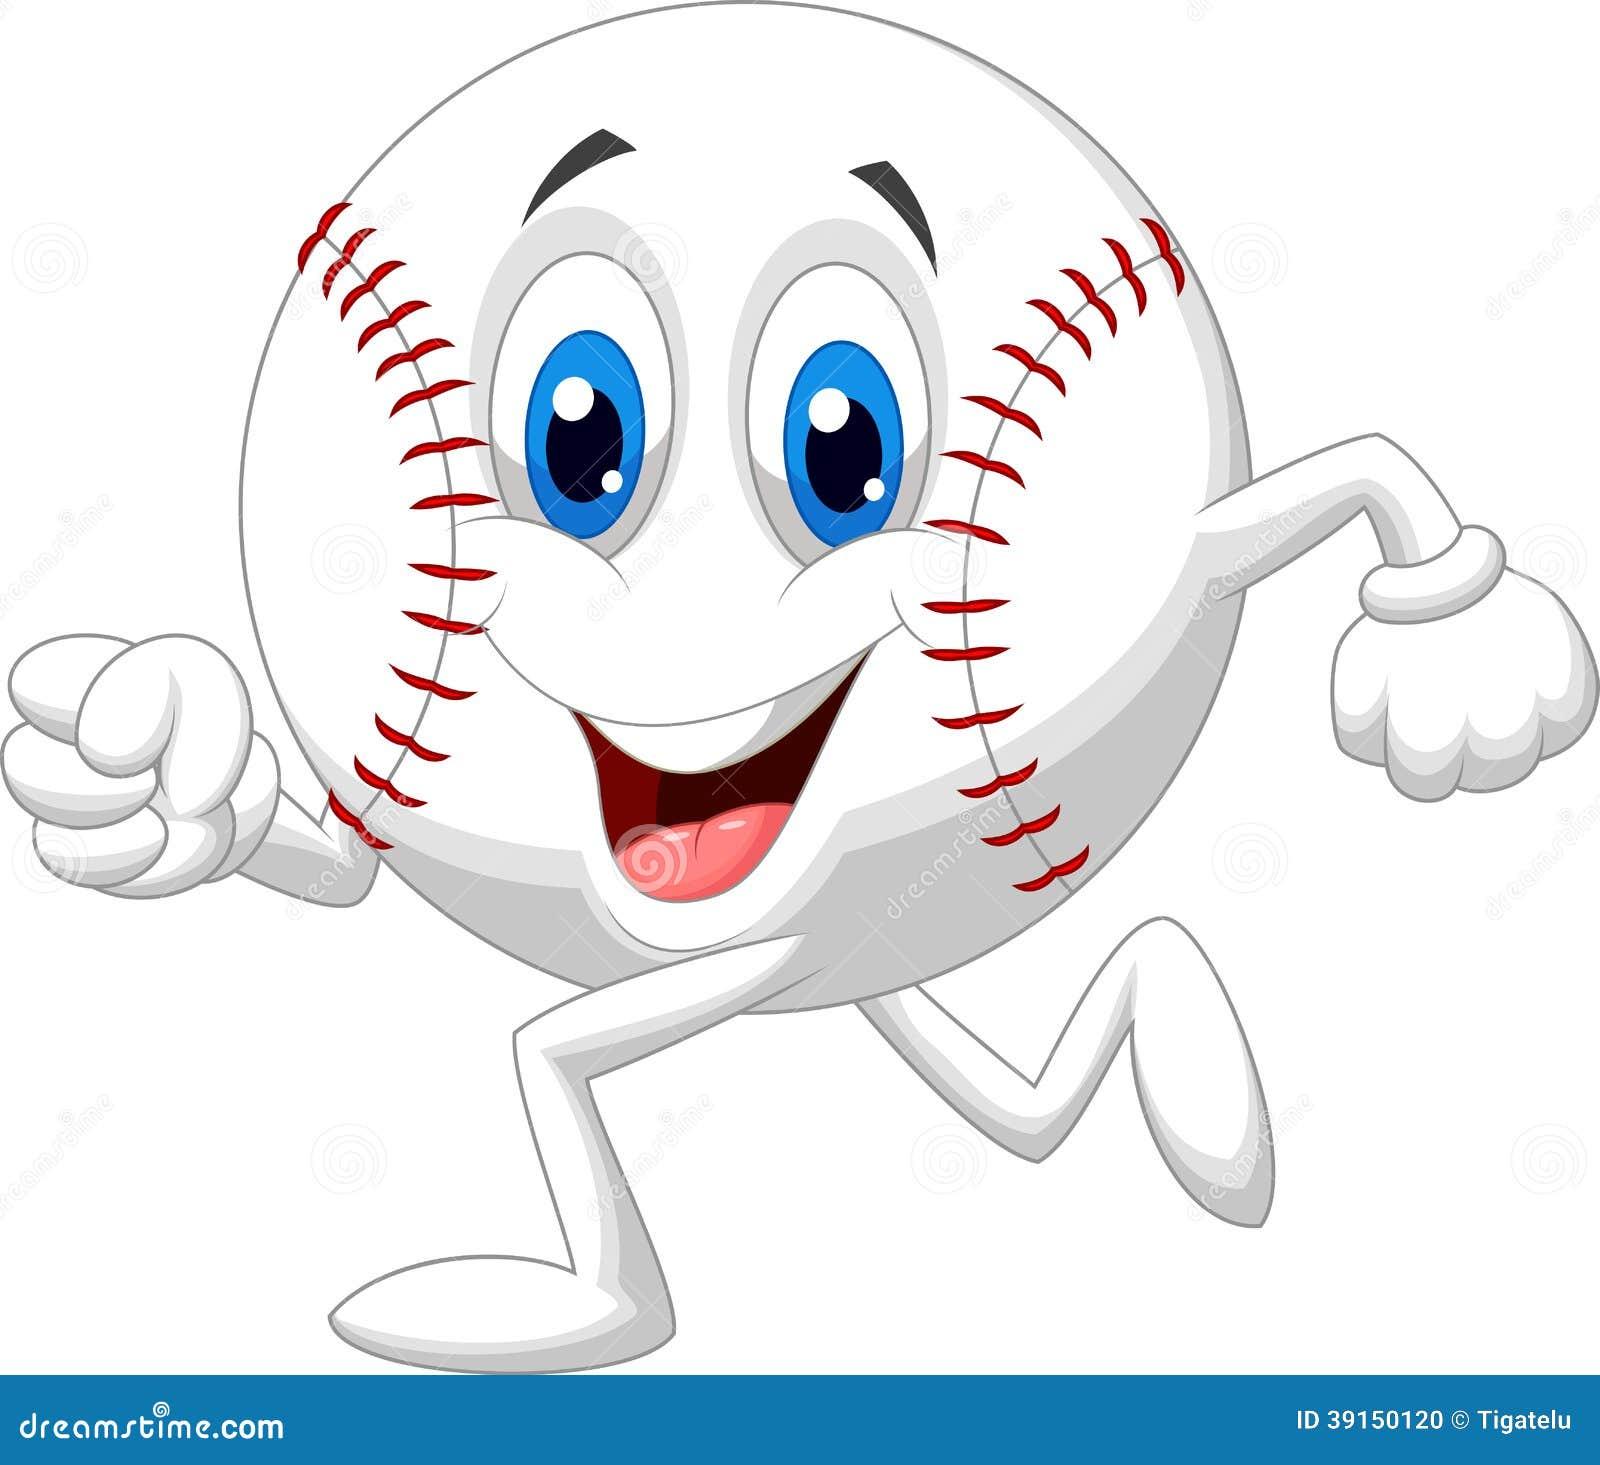 1000 Interesting Baseball Field Photos  Pexels  Free